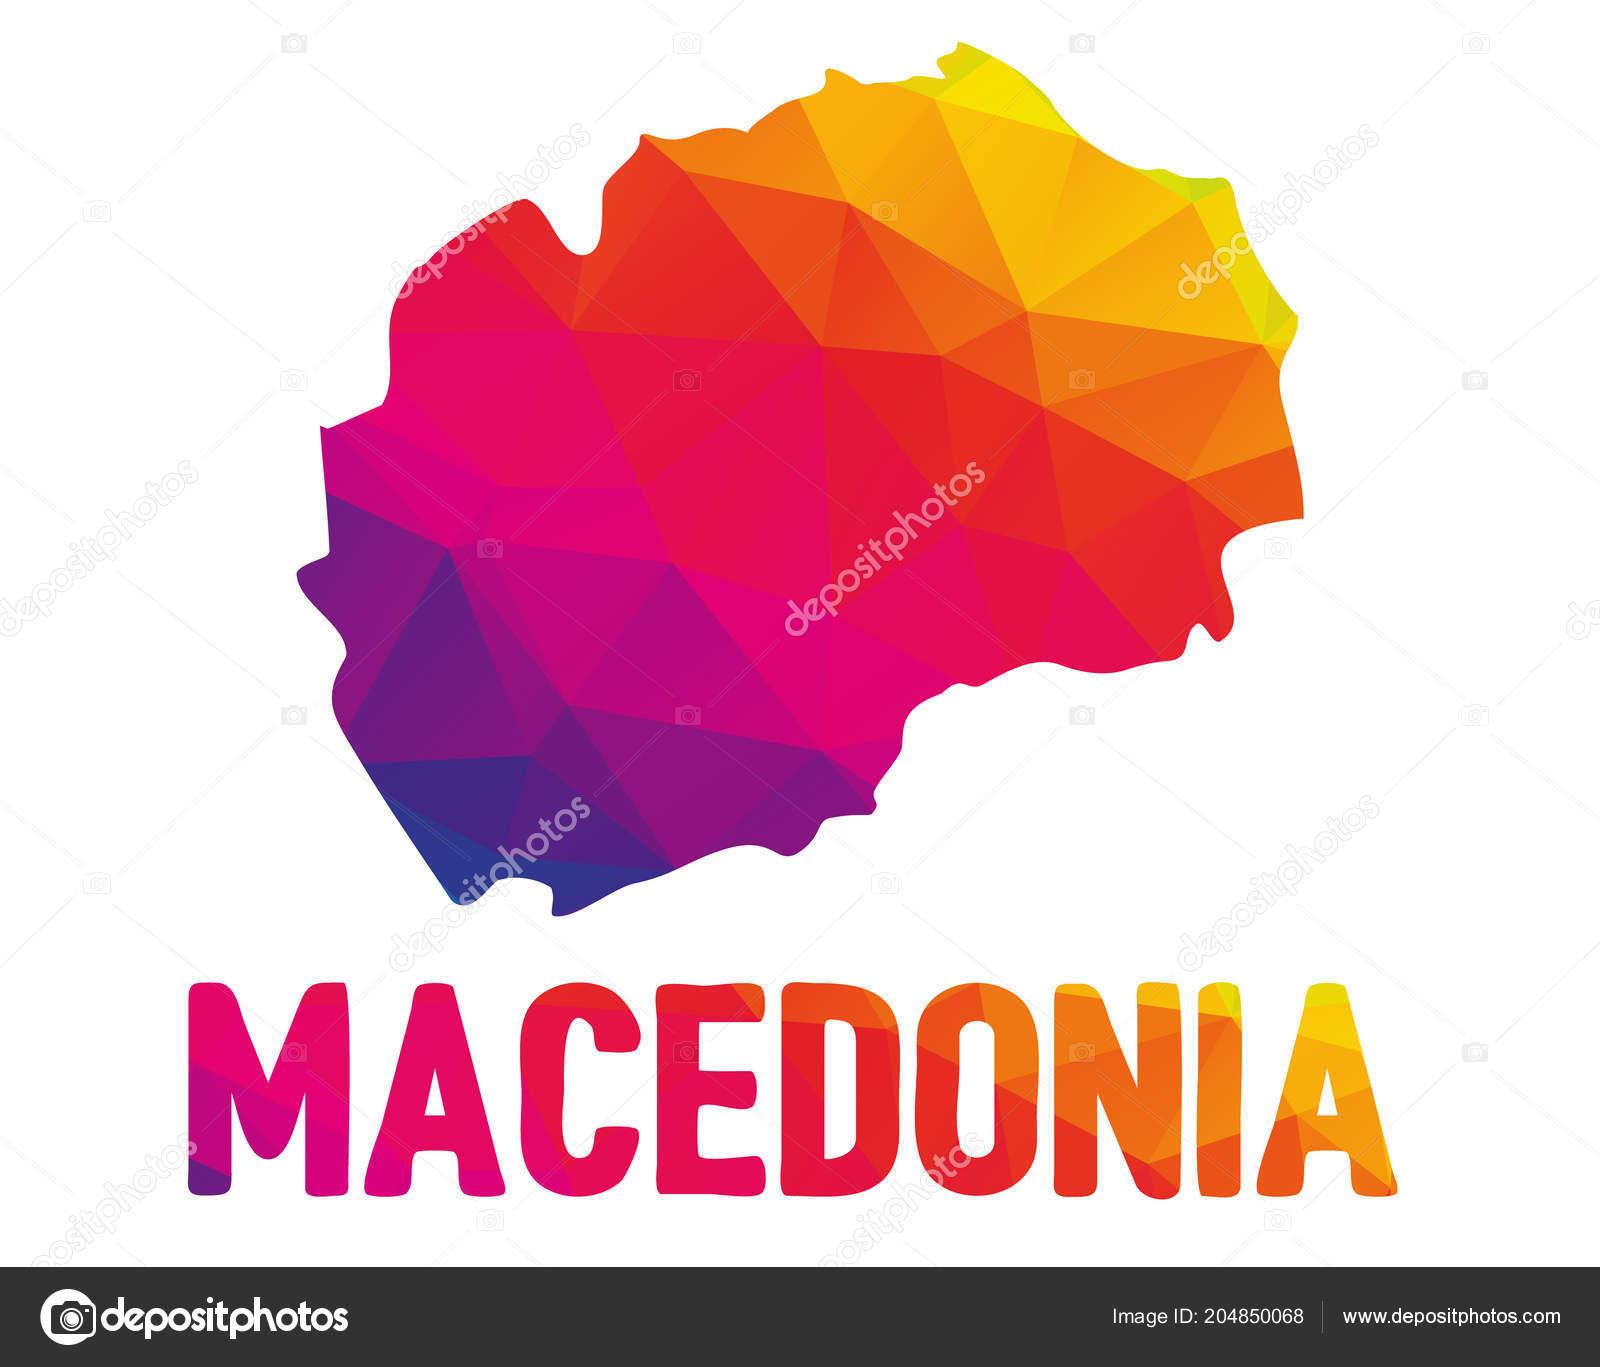 Low Polygonal Map Republic Macedonia Makedonija Republic ... on tanzania maps, portugal maps, republic of macedonia national football team, macedonia maps, socialist federal republic of yugoslavia, vanuatu maps, breakup of yugoslavia, macedonian language, trinidad and tobago maps, hungary maps, bangladesh maps, serbia and montenegro, benin maps, taiwan maps, oman maps, suriname maps, gibraltar maps, romani people, martinique maps, maldives maps, russia maps, senegal maps, samoa maps, malawi maps, zimbabwe maps, puerto rico maps, republic of kosovo,